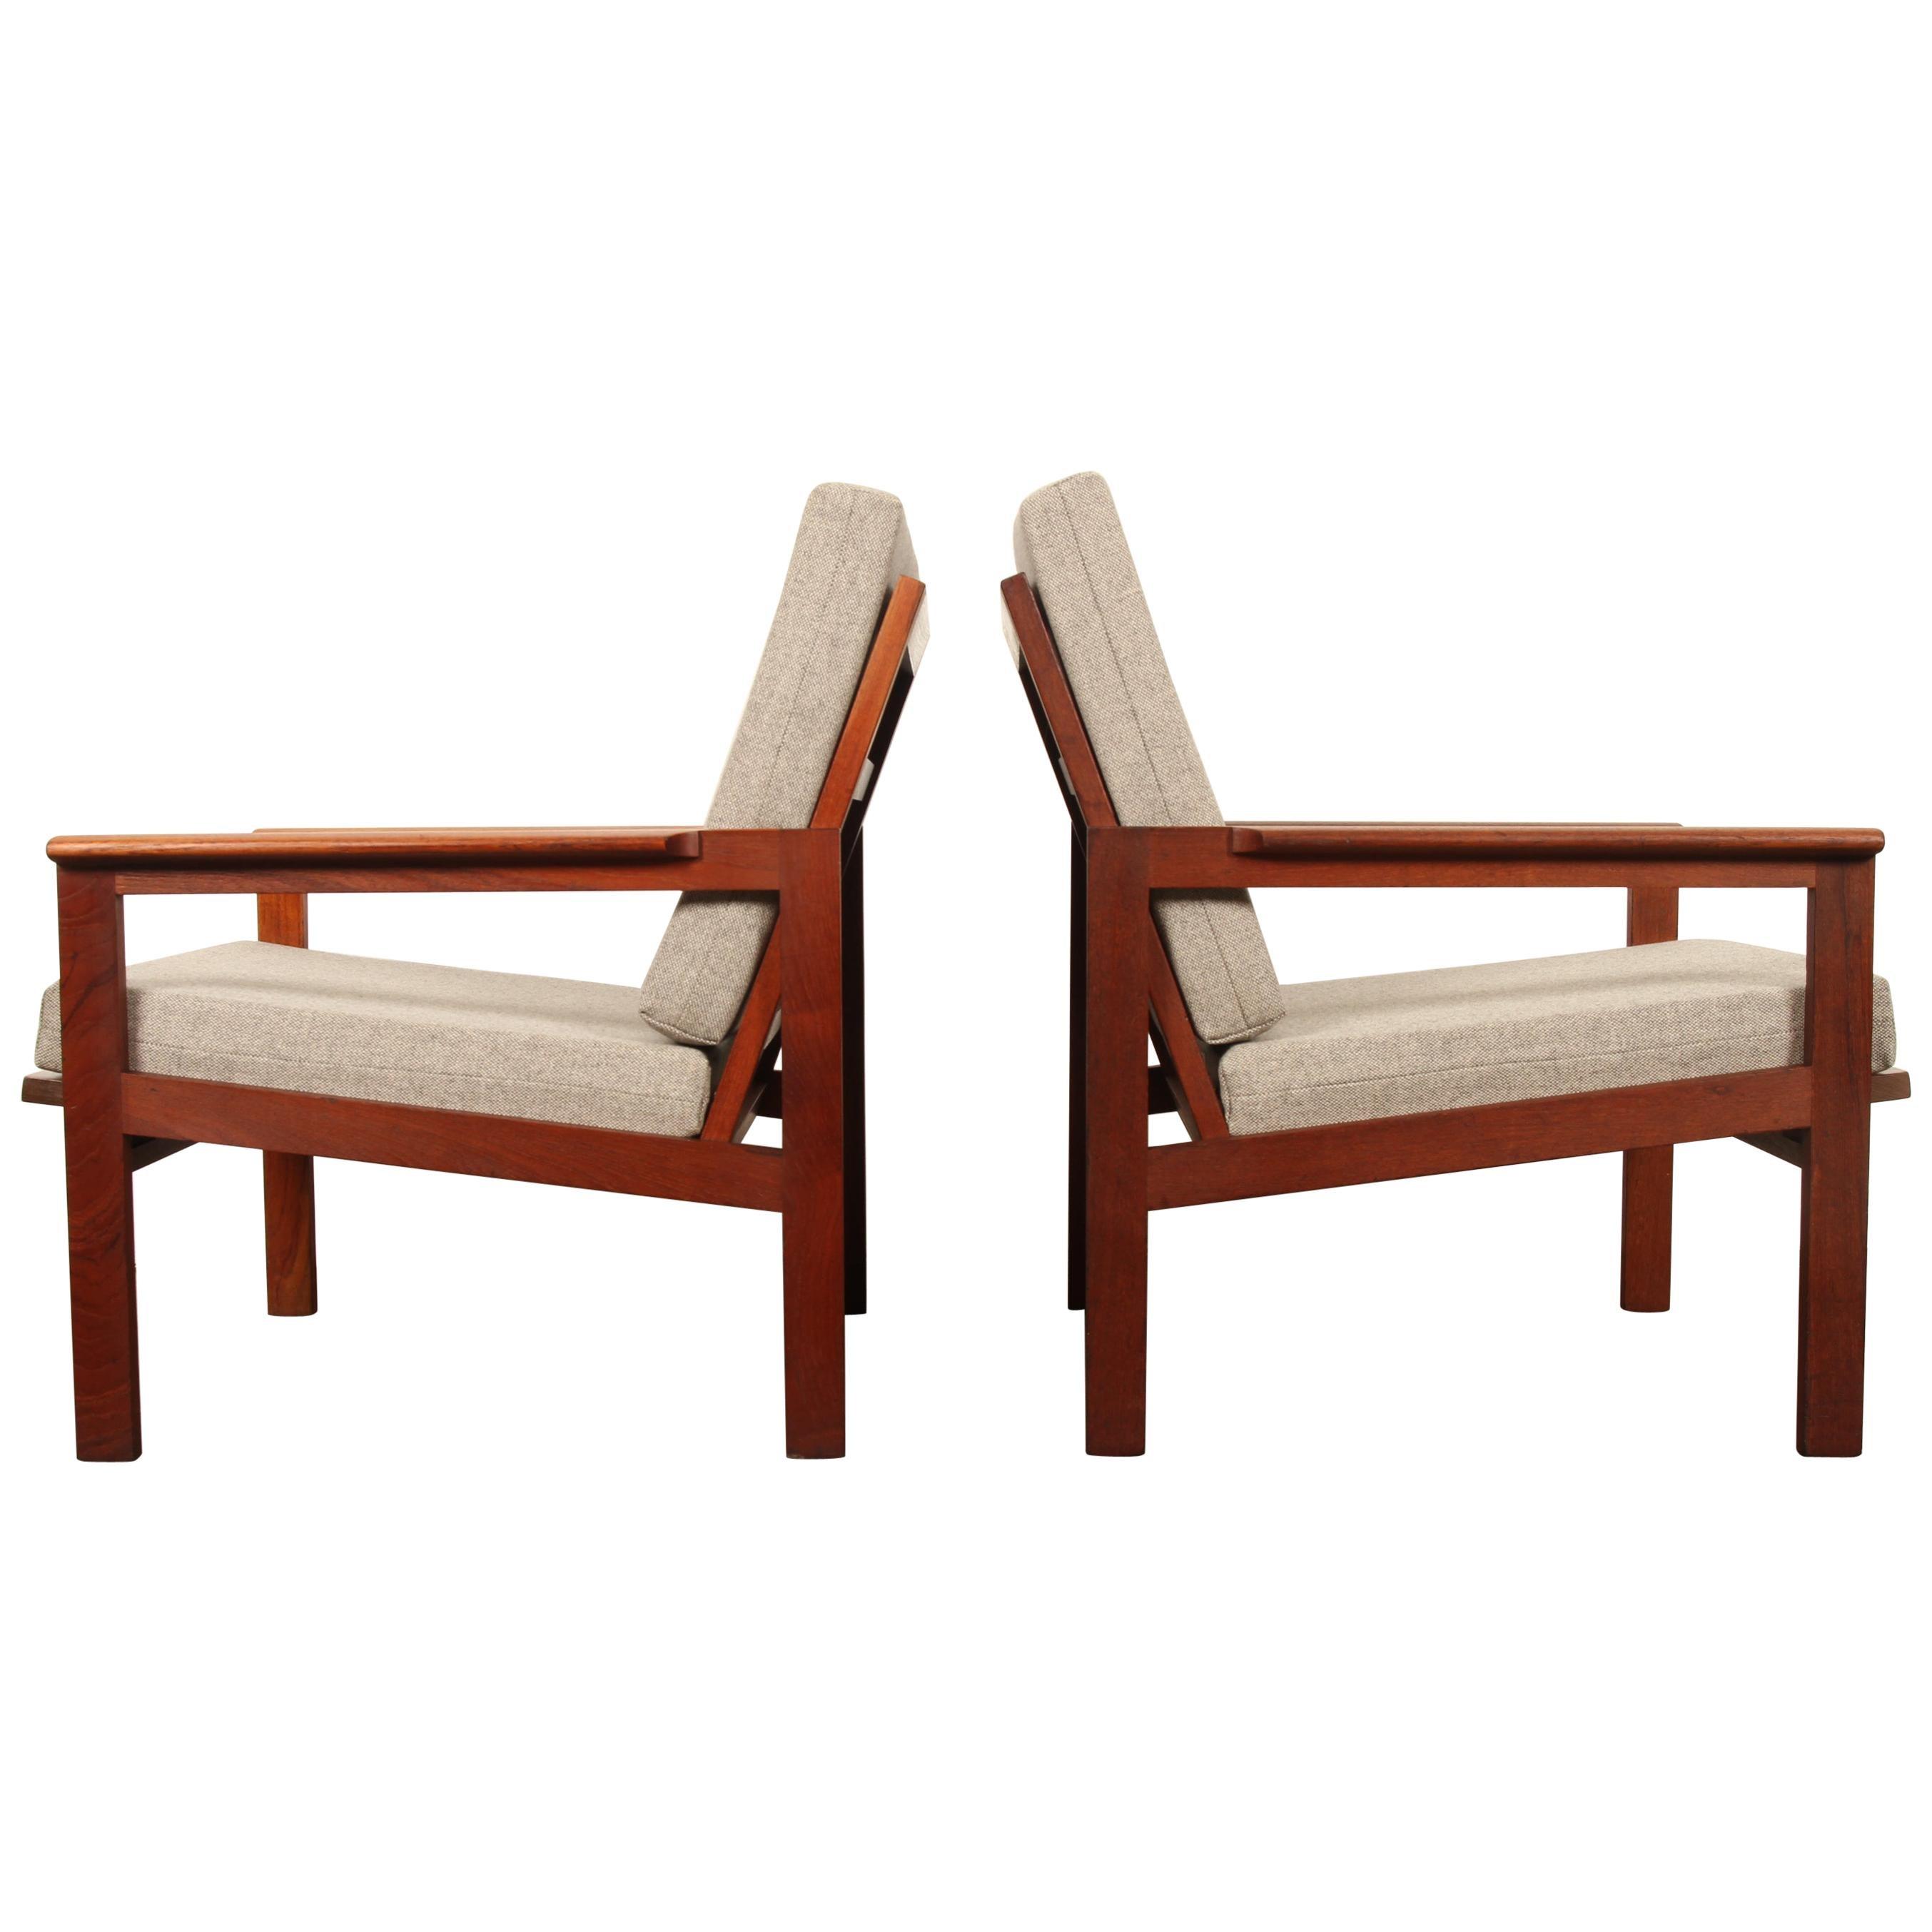 Set of 2 Danish Capella Lounge Chairs in Teak